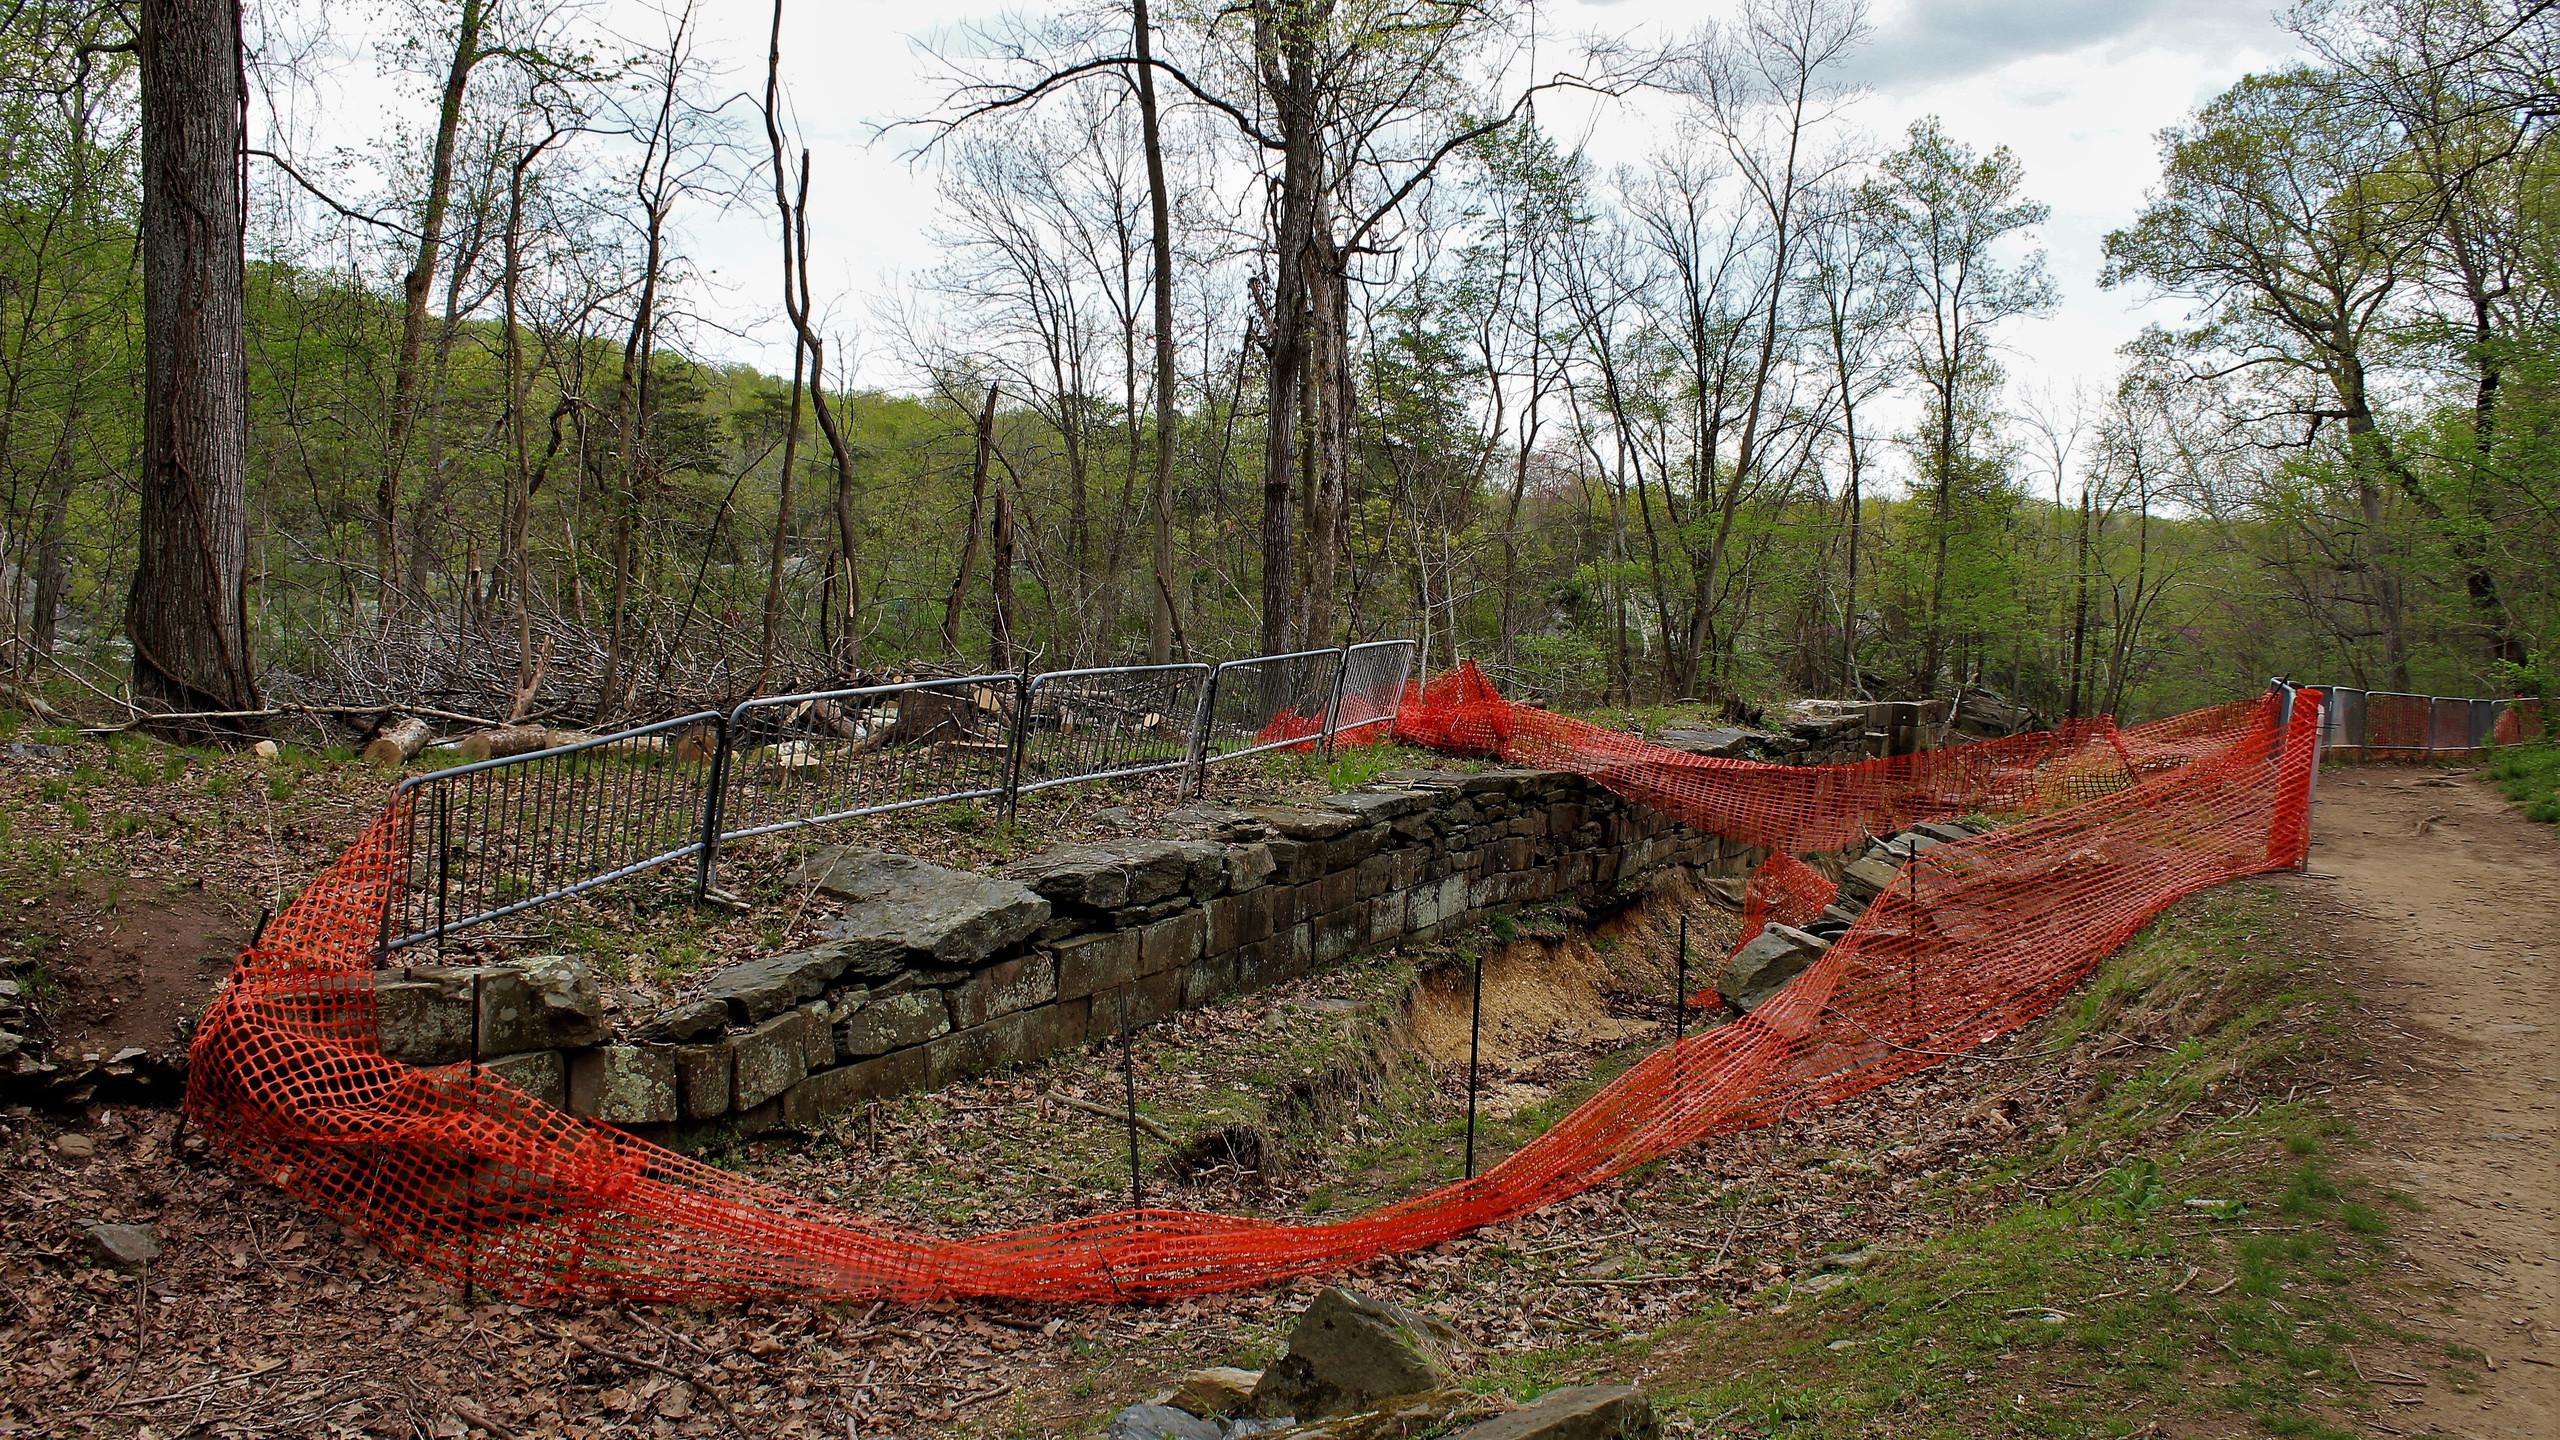 Erosion Eating Away at a Lock